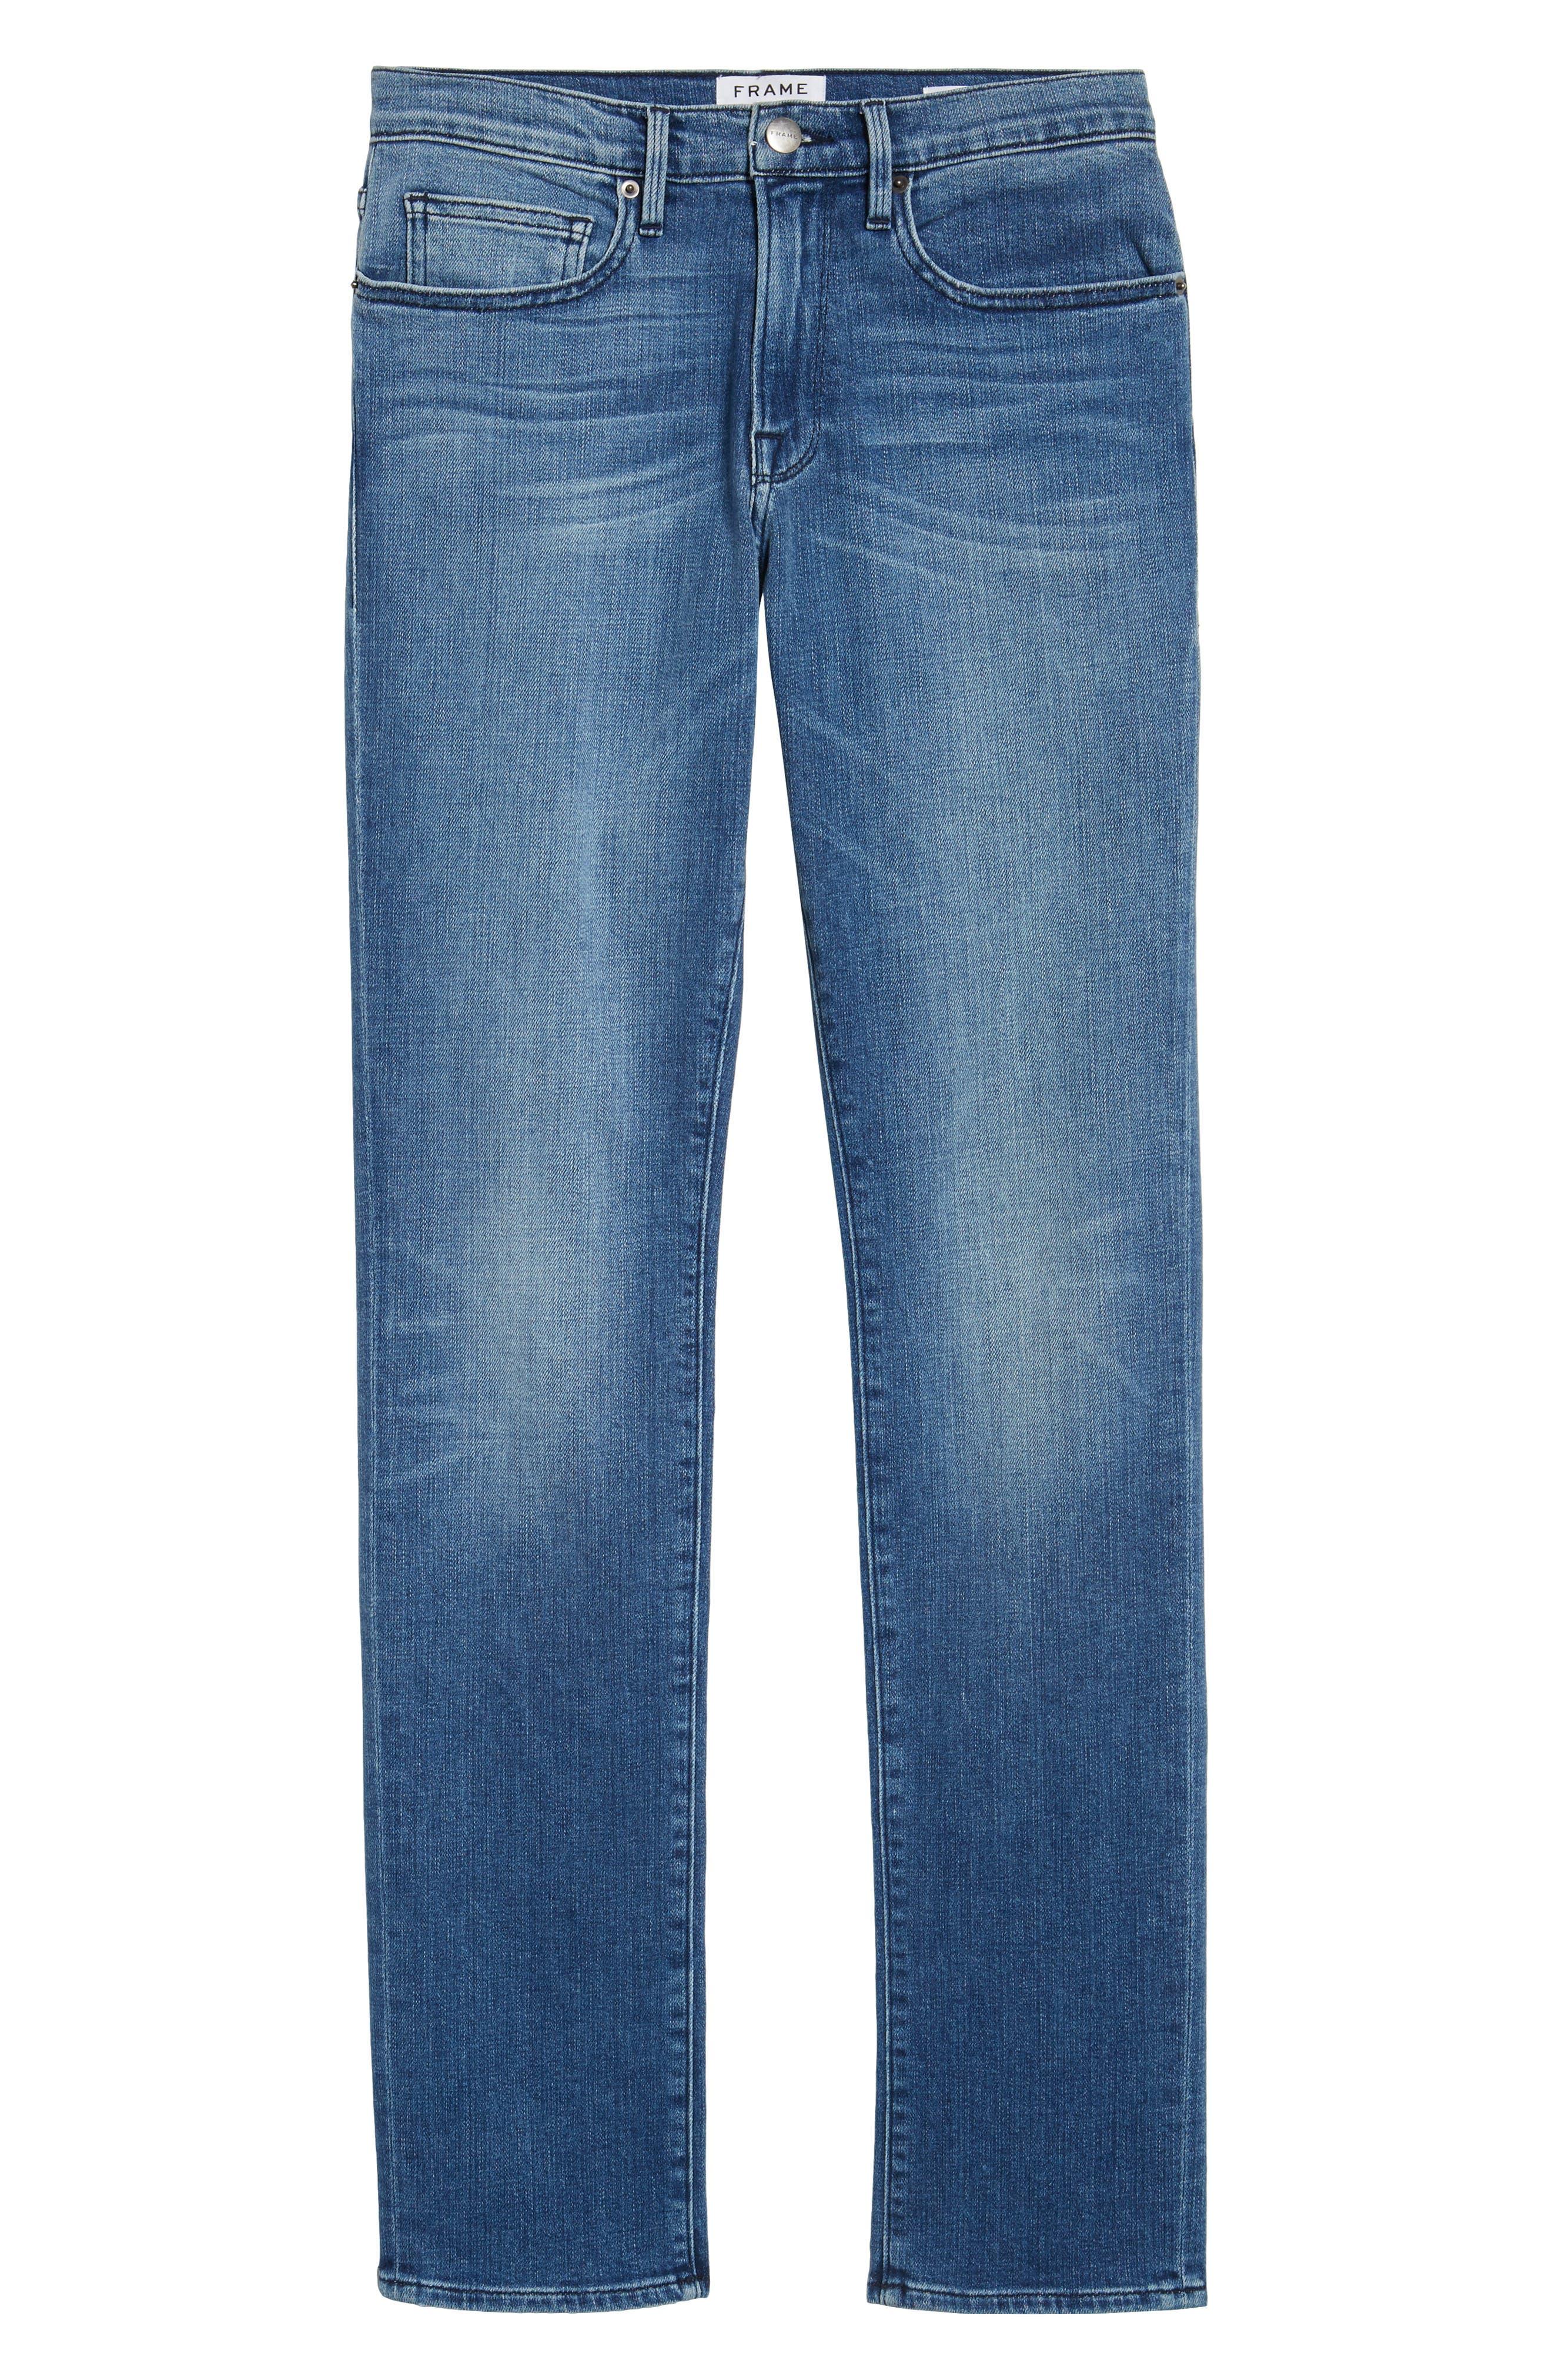 FRAME, L'Homme Slim Fit Jeans, Alternate thumbnail 7, color, BRADBURY